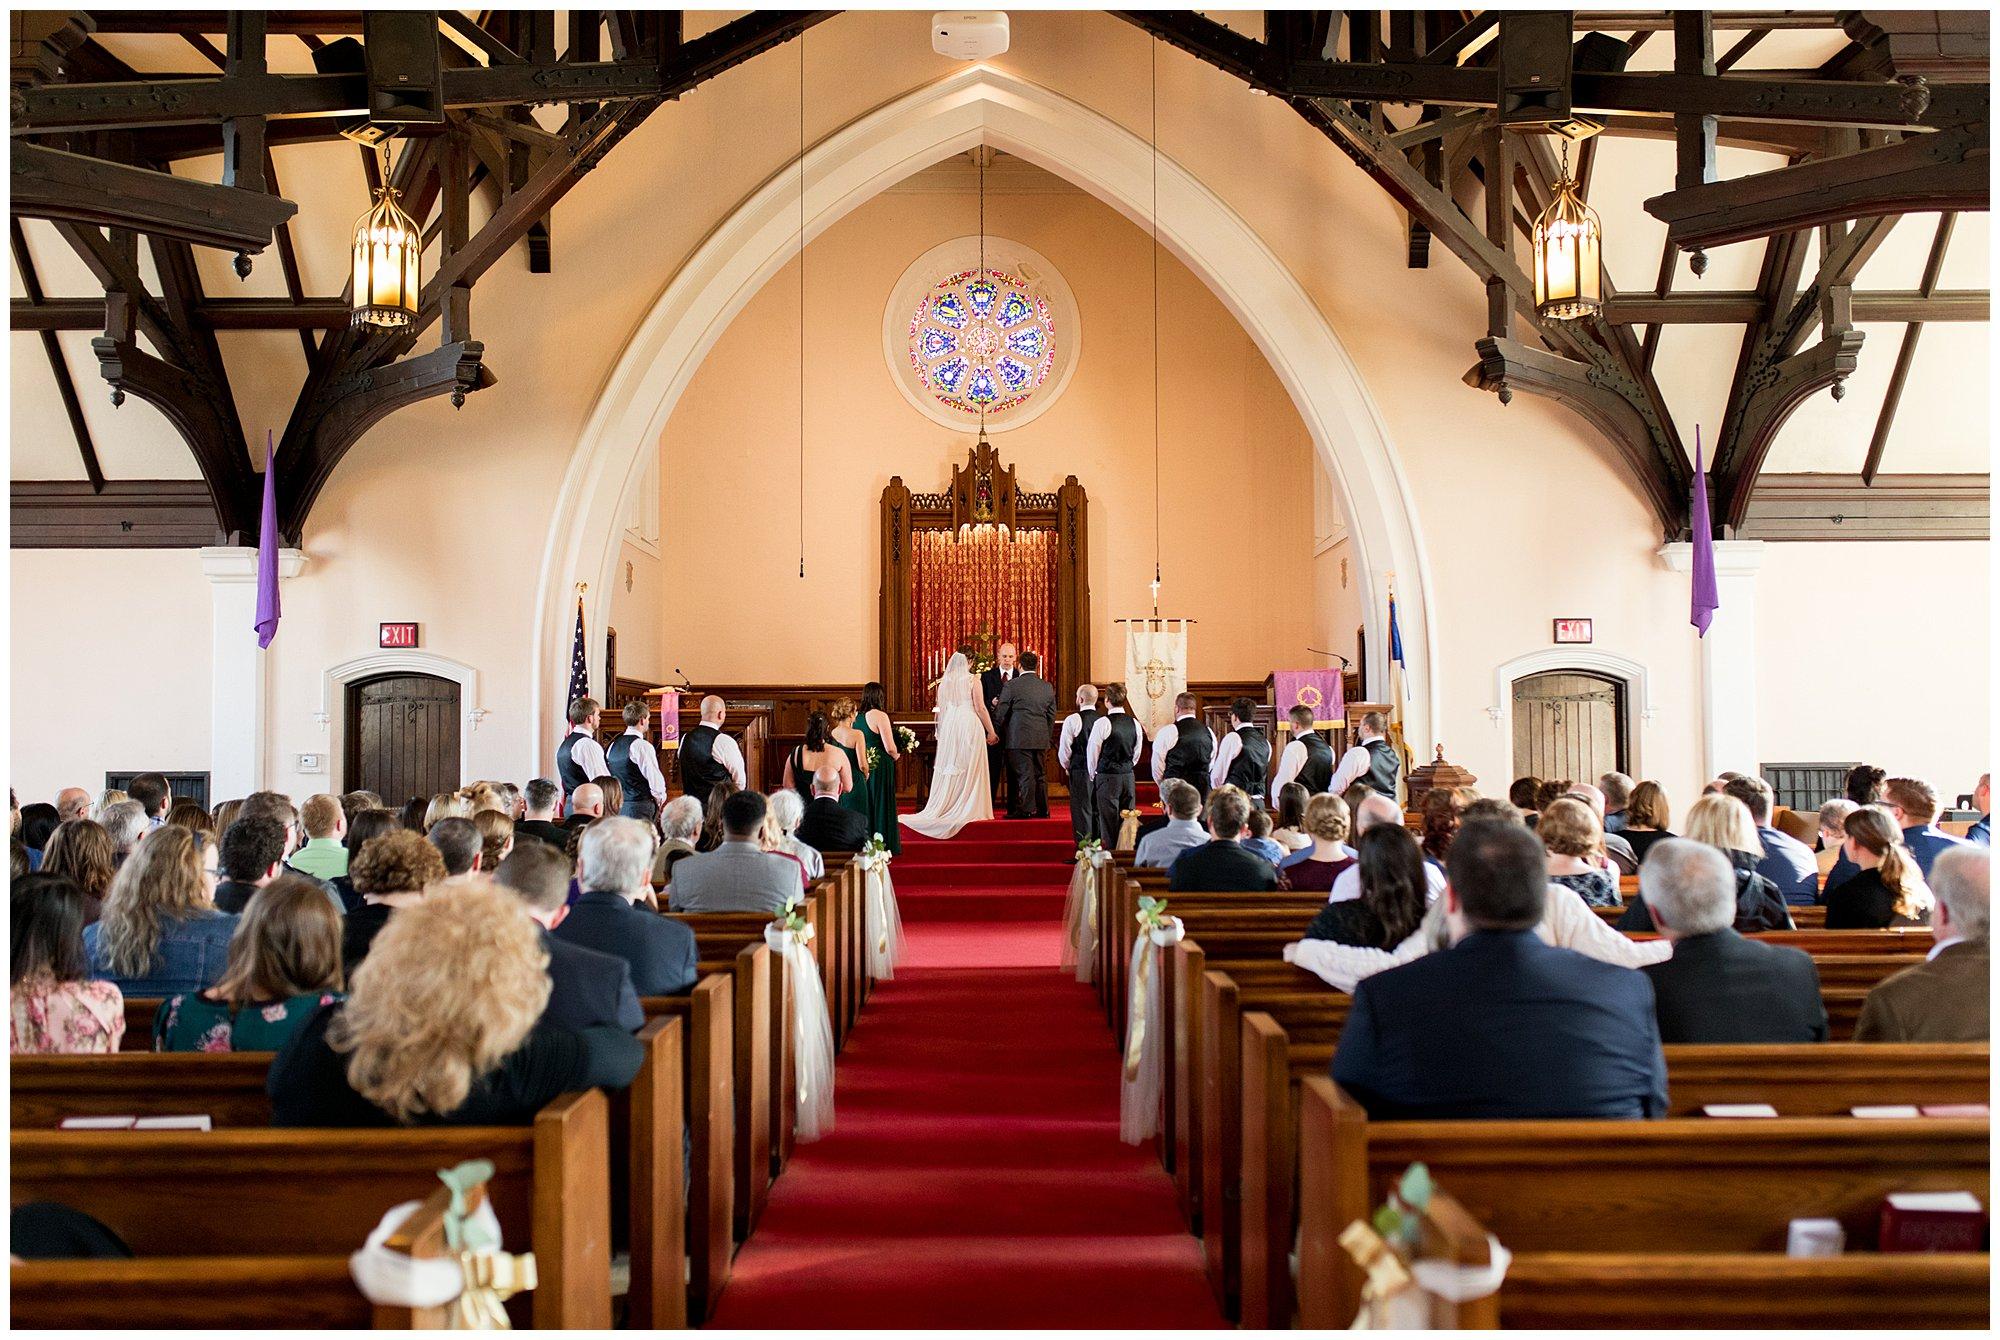 Irvington United Methodist Church wedding ceremony